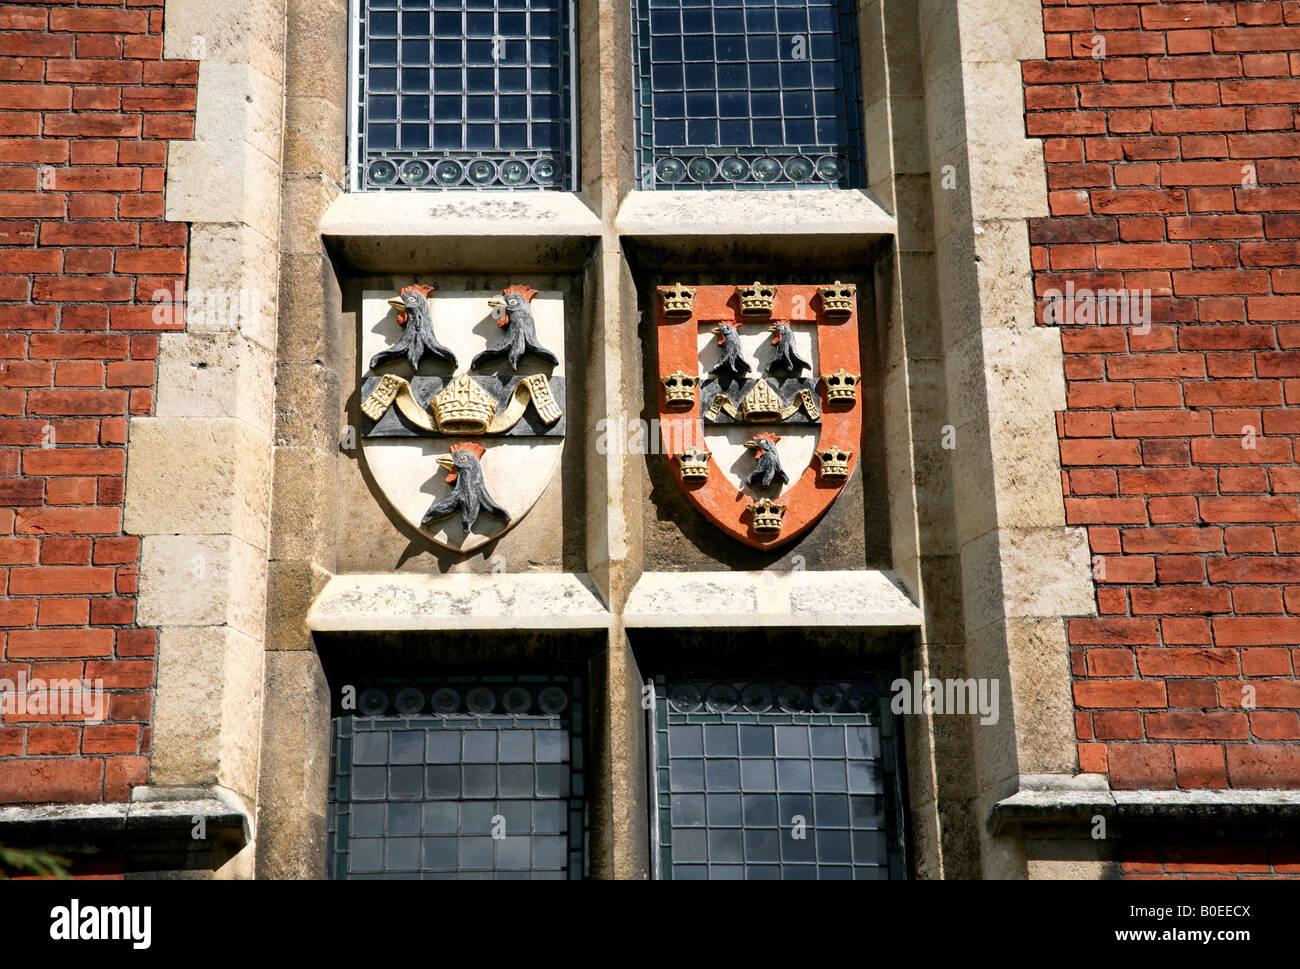 Coat of arms of Jesus College Cambridge - Stock Image